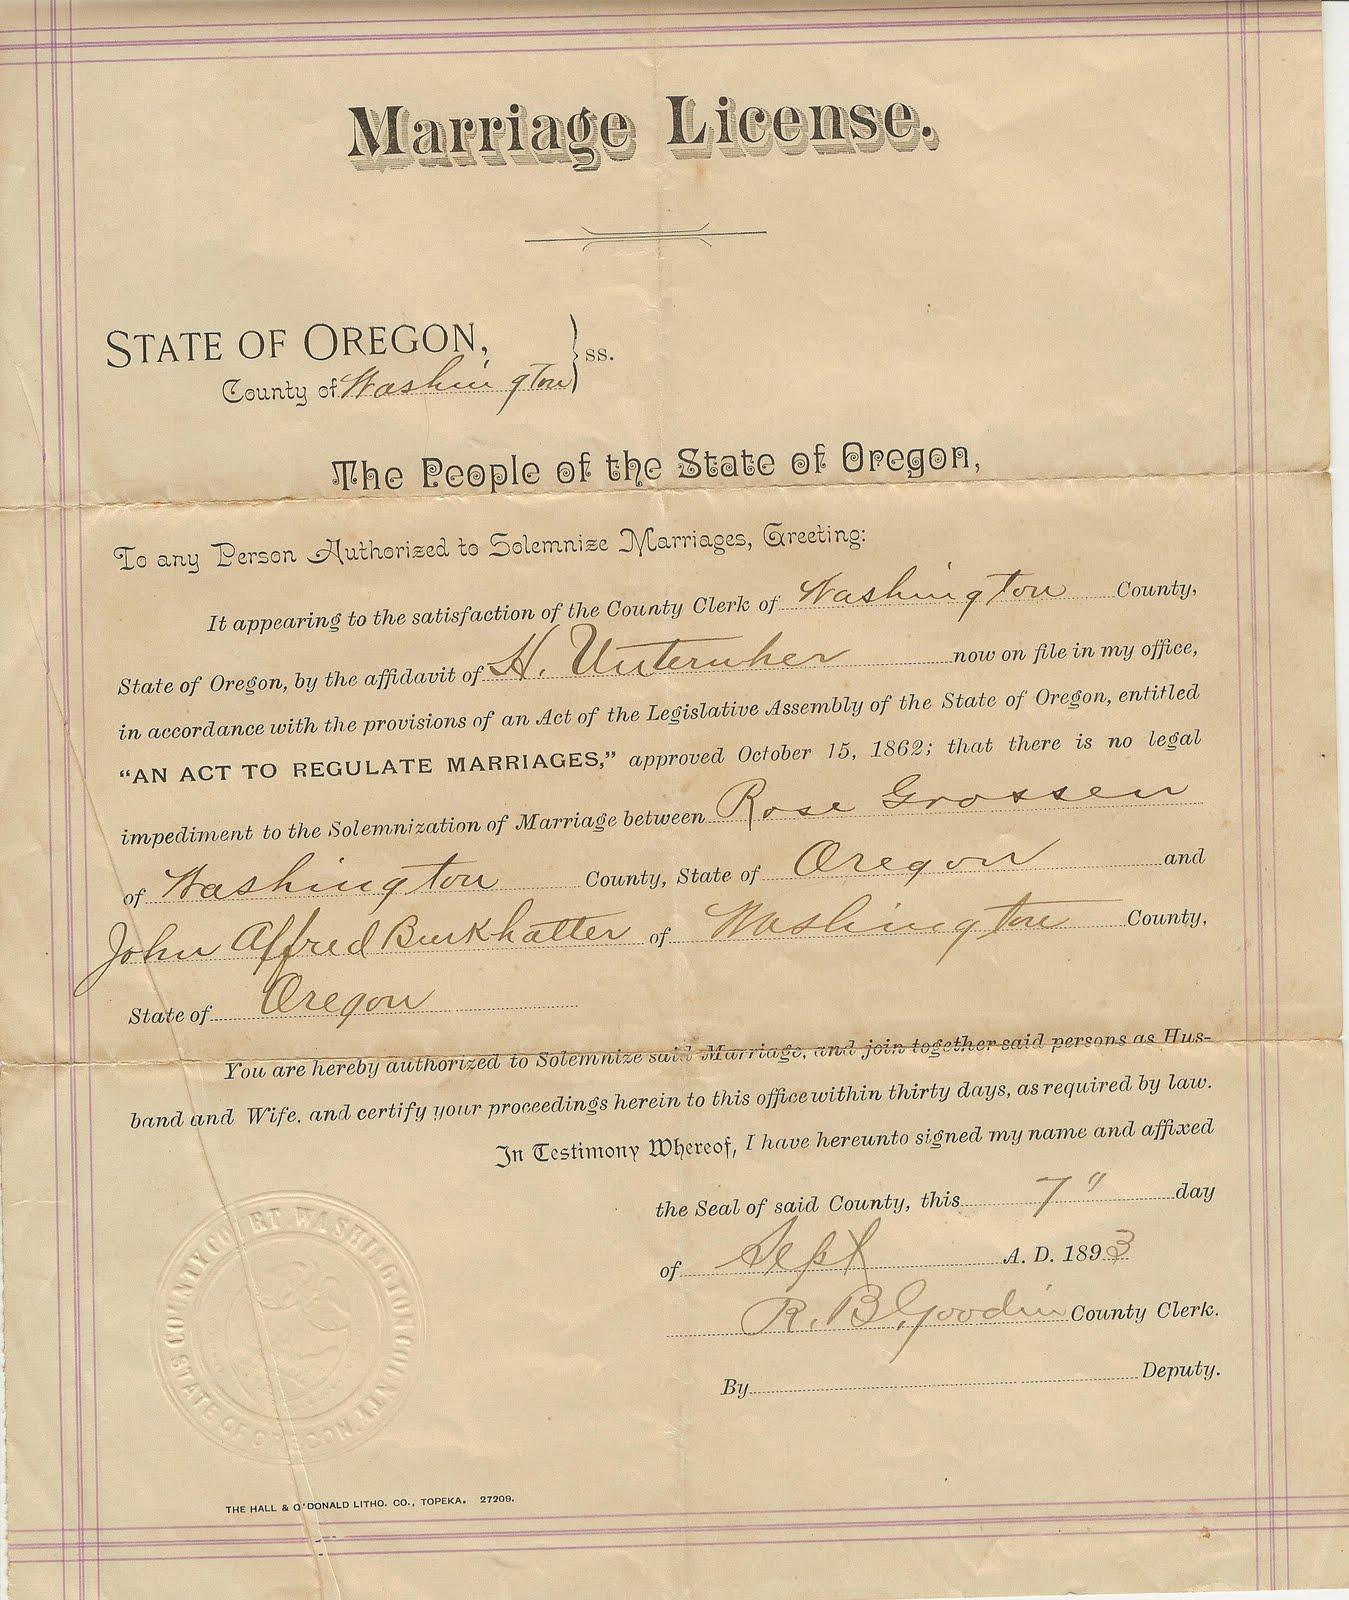 oregon marriage burkhalter tillamook rosa 1893 certificate meadow sleepy farm citizen resident became 1900 states april united alfred grossen john